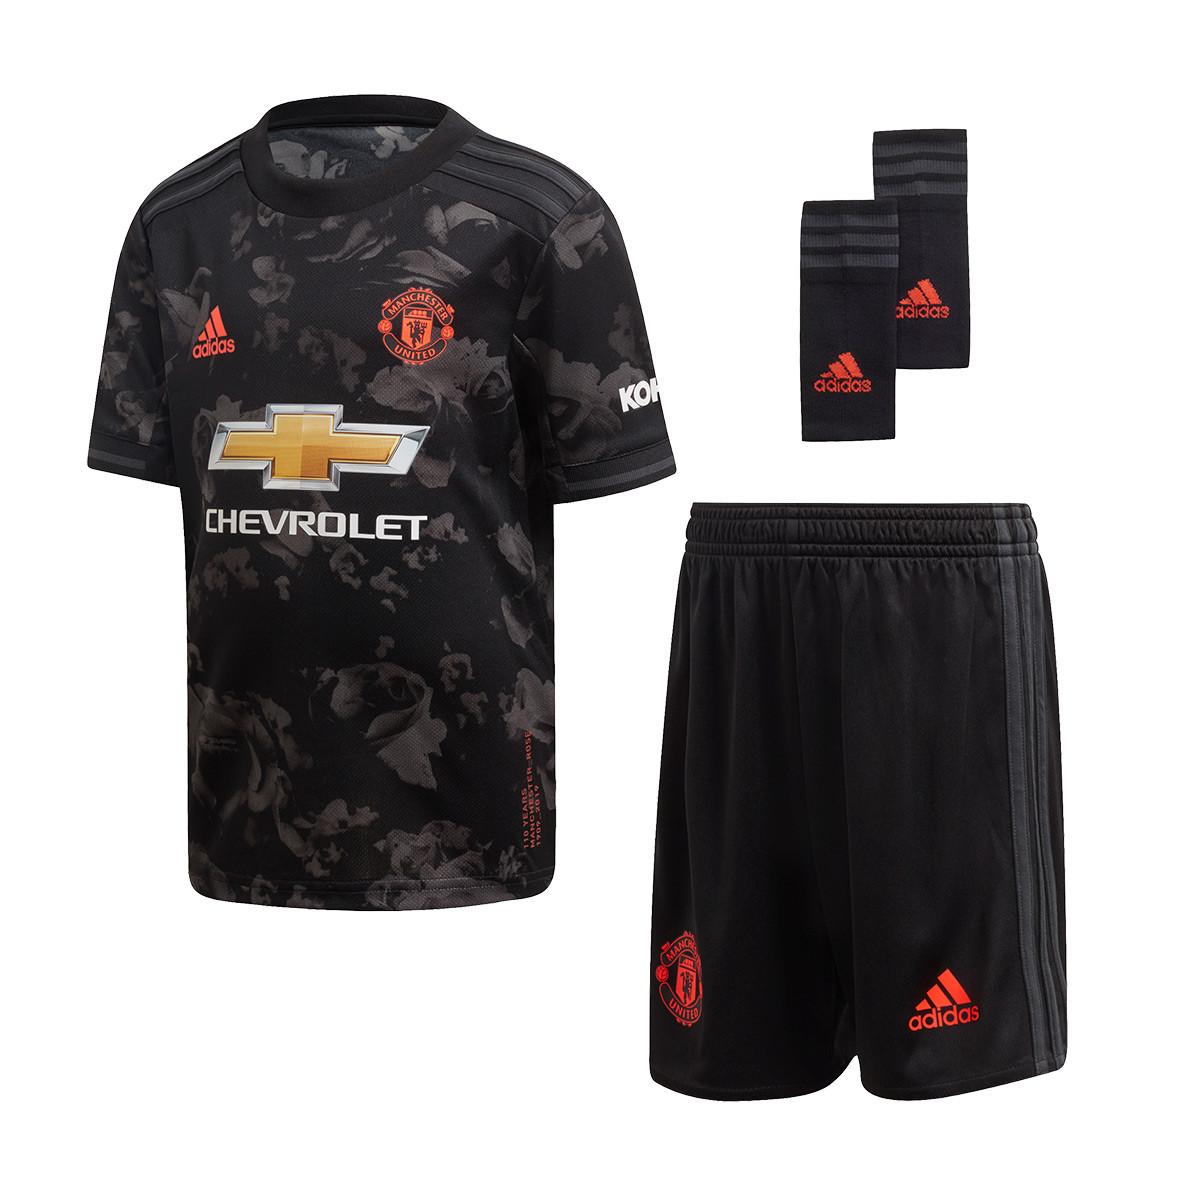 Tenue adidas Manchester United Third 2019 2020 Enfant